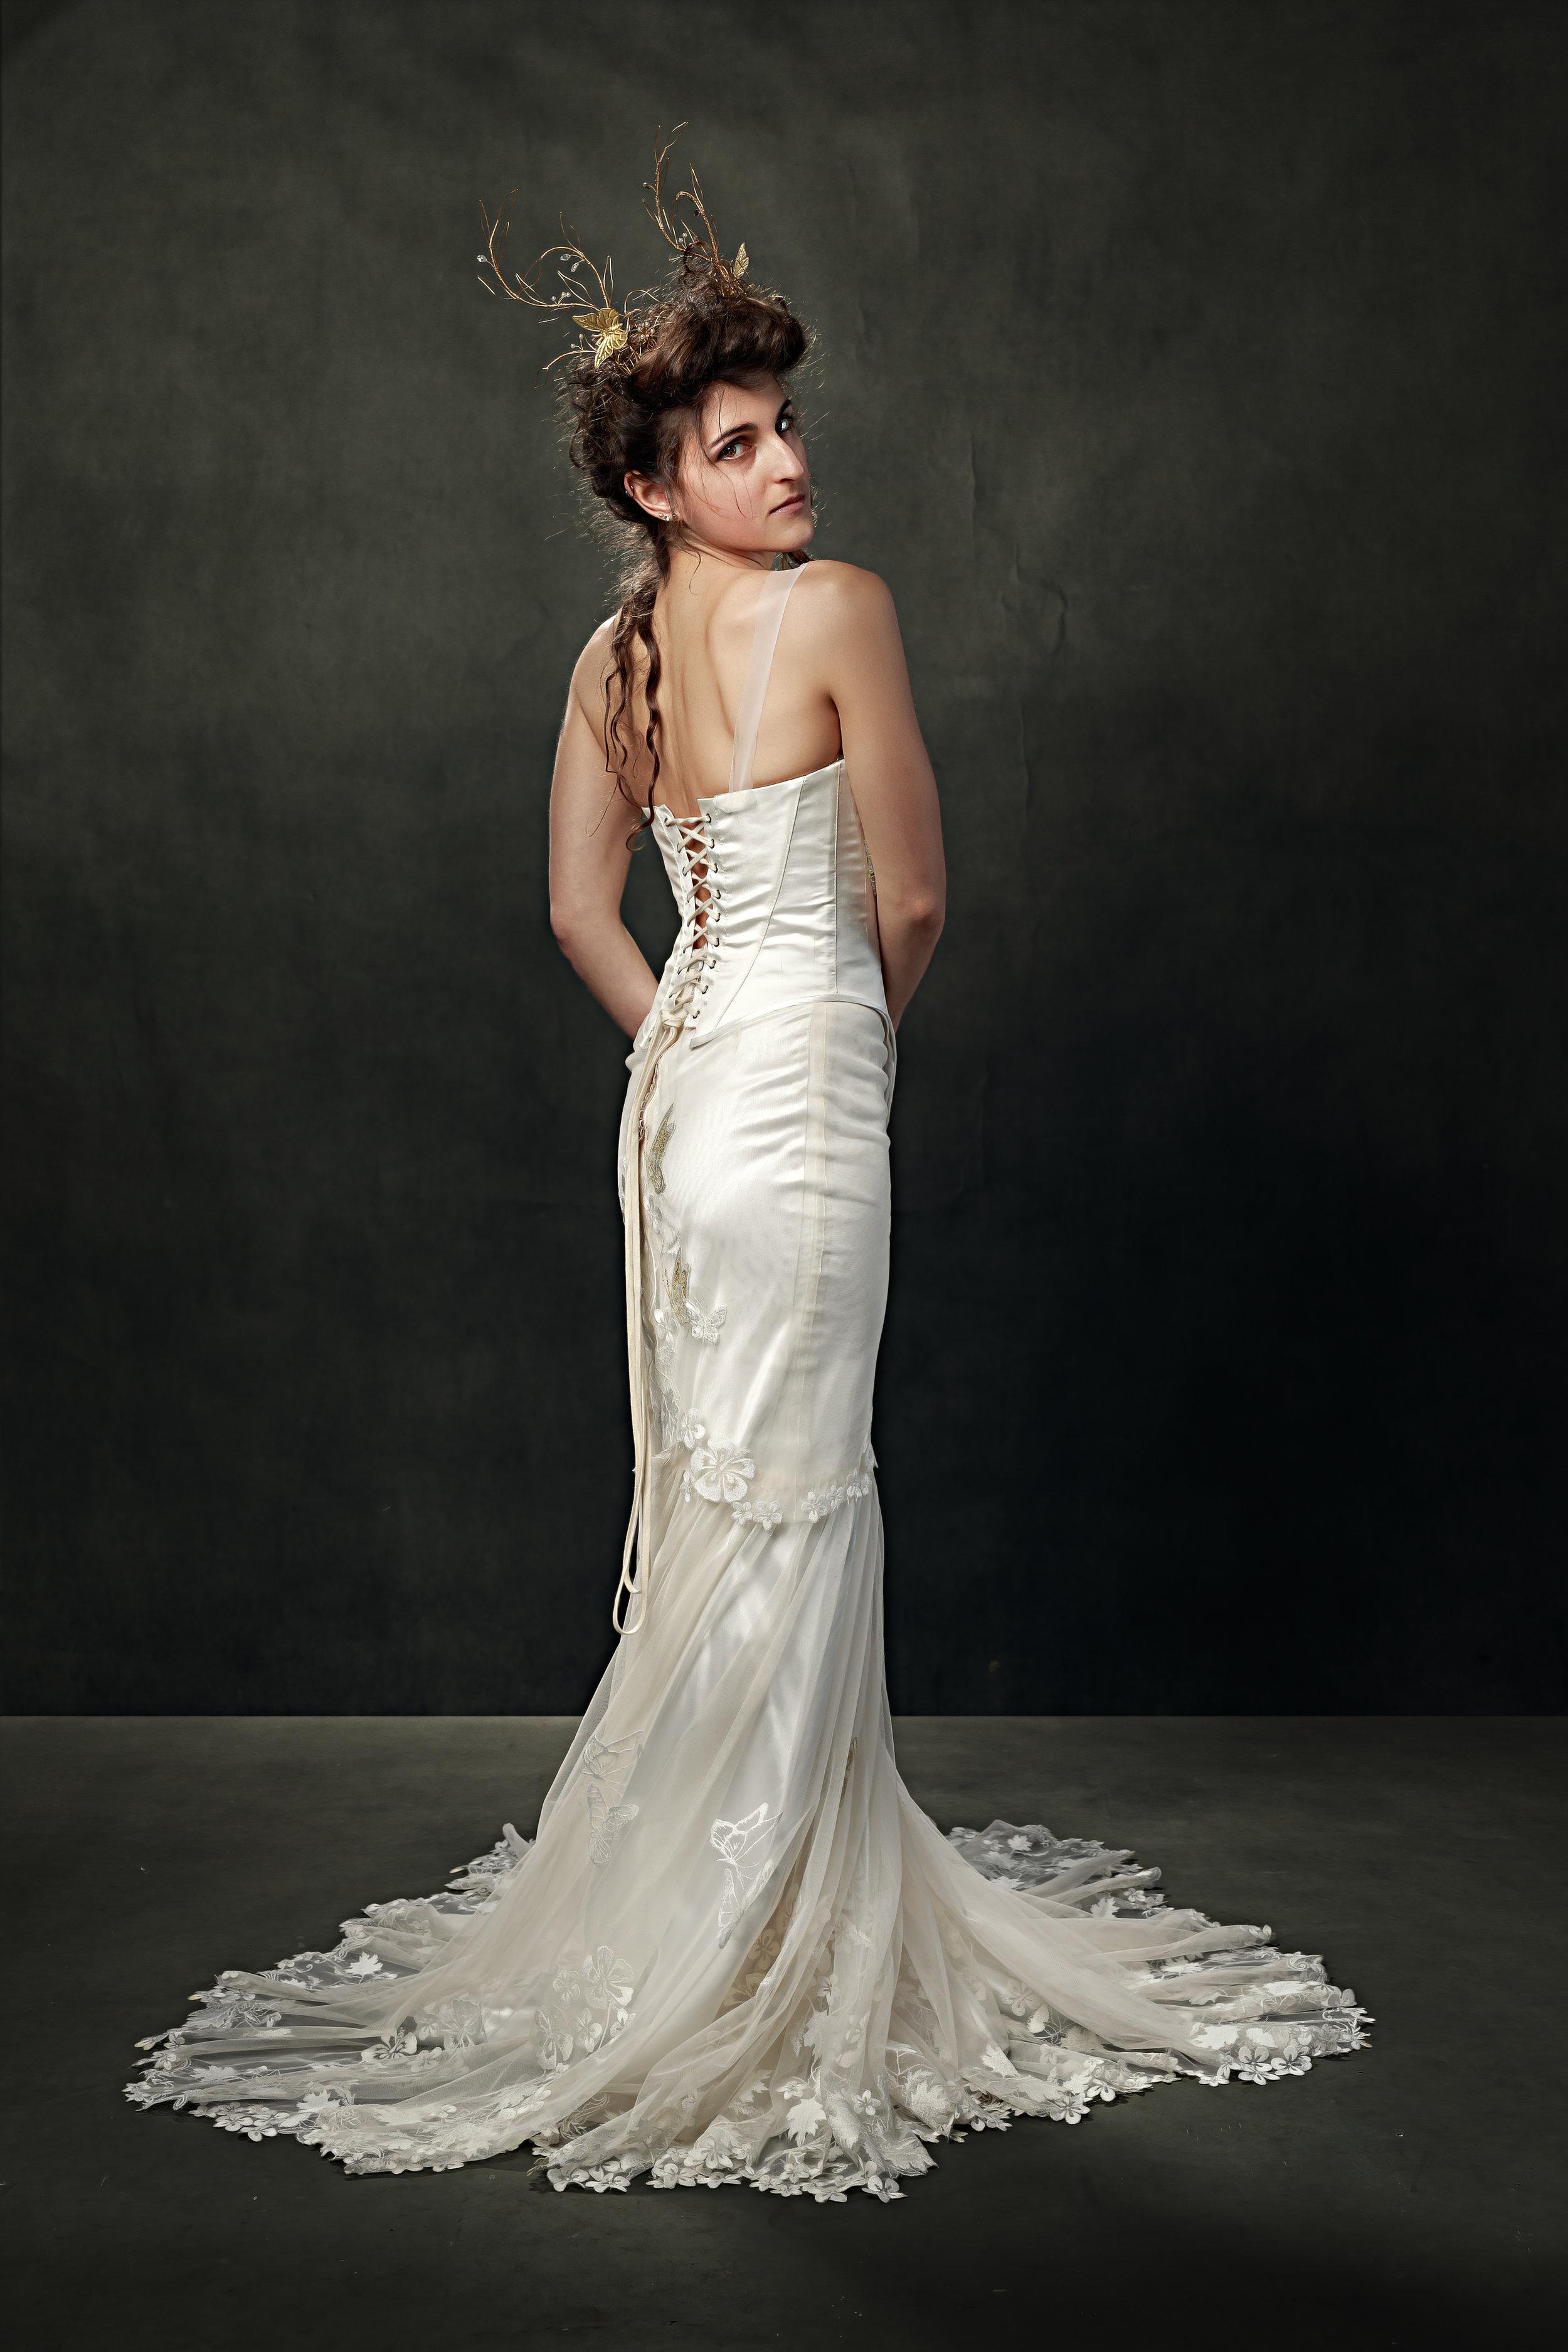 martin dobson wedding dress - 0090 - March 07, 2018 - copyright Foyers Photography-Edit.jpg